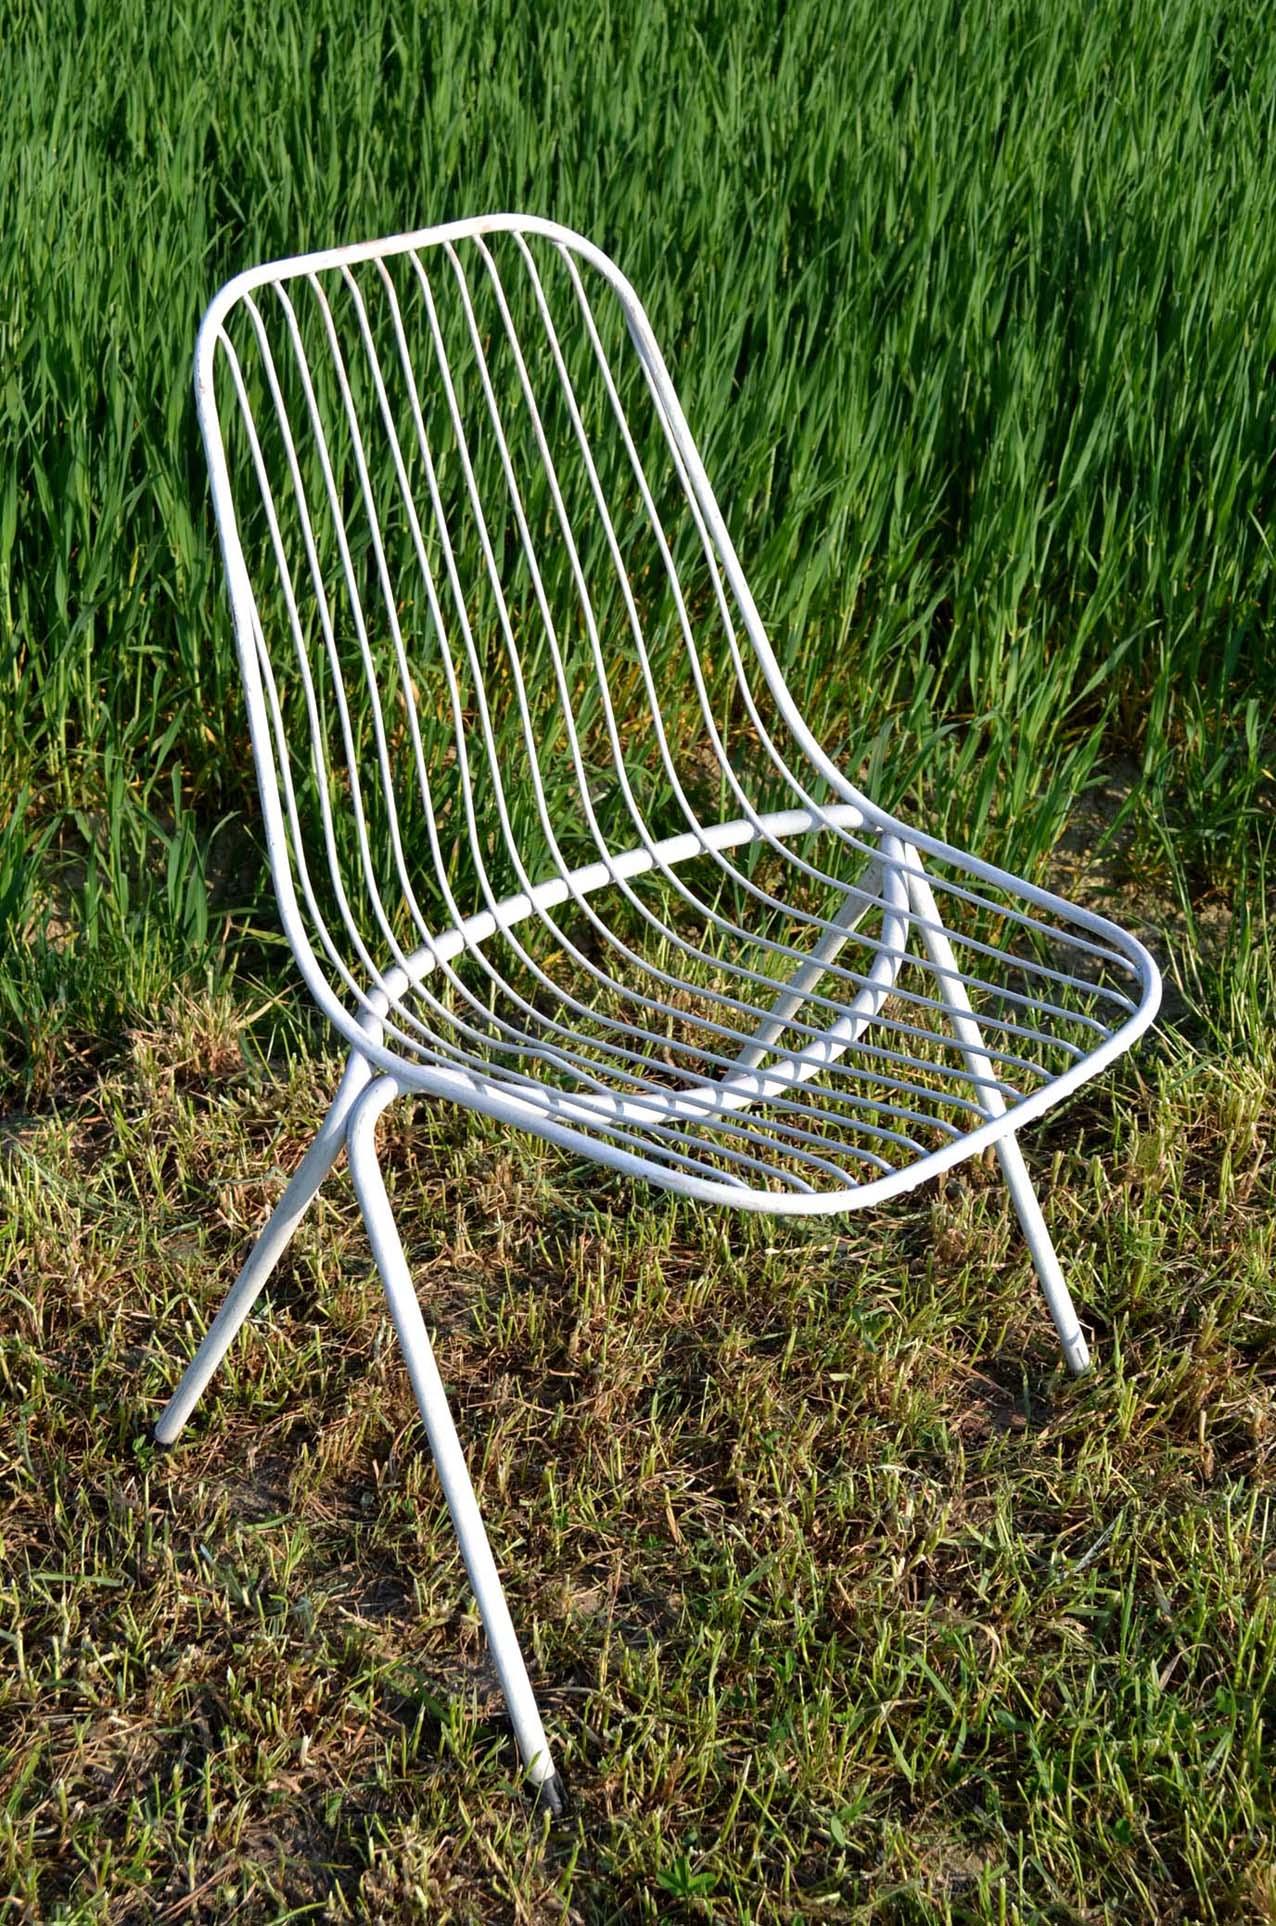 stella bassecourt chaises vintage fabrication suisse. Black Bedroom Furniture Sets. Home Design Ideas